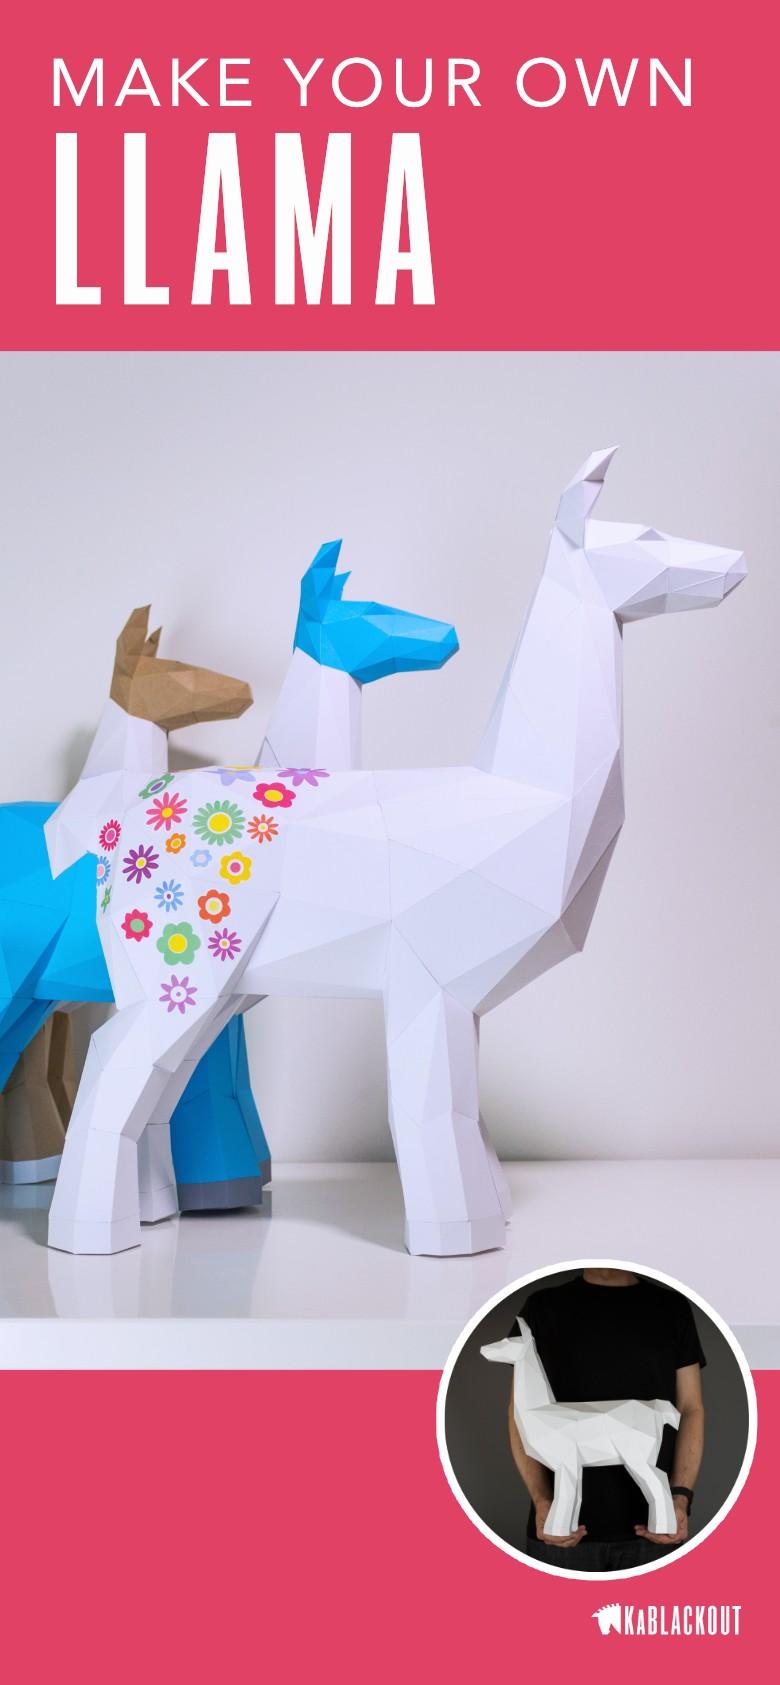 Papercraft Kirby Llama Papercraft Low Poly Llama Paper Llama Craft Llama Lover